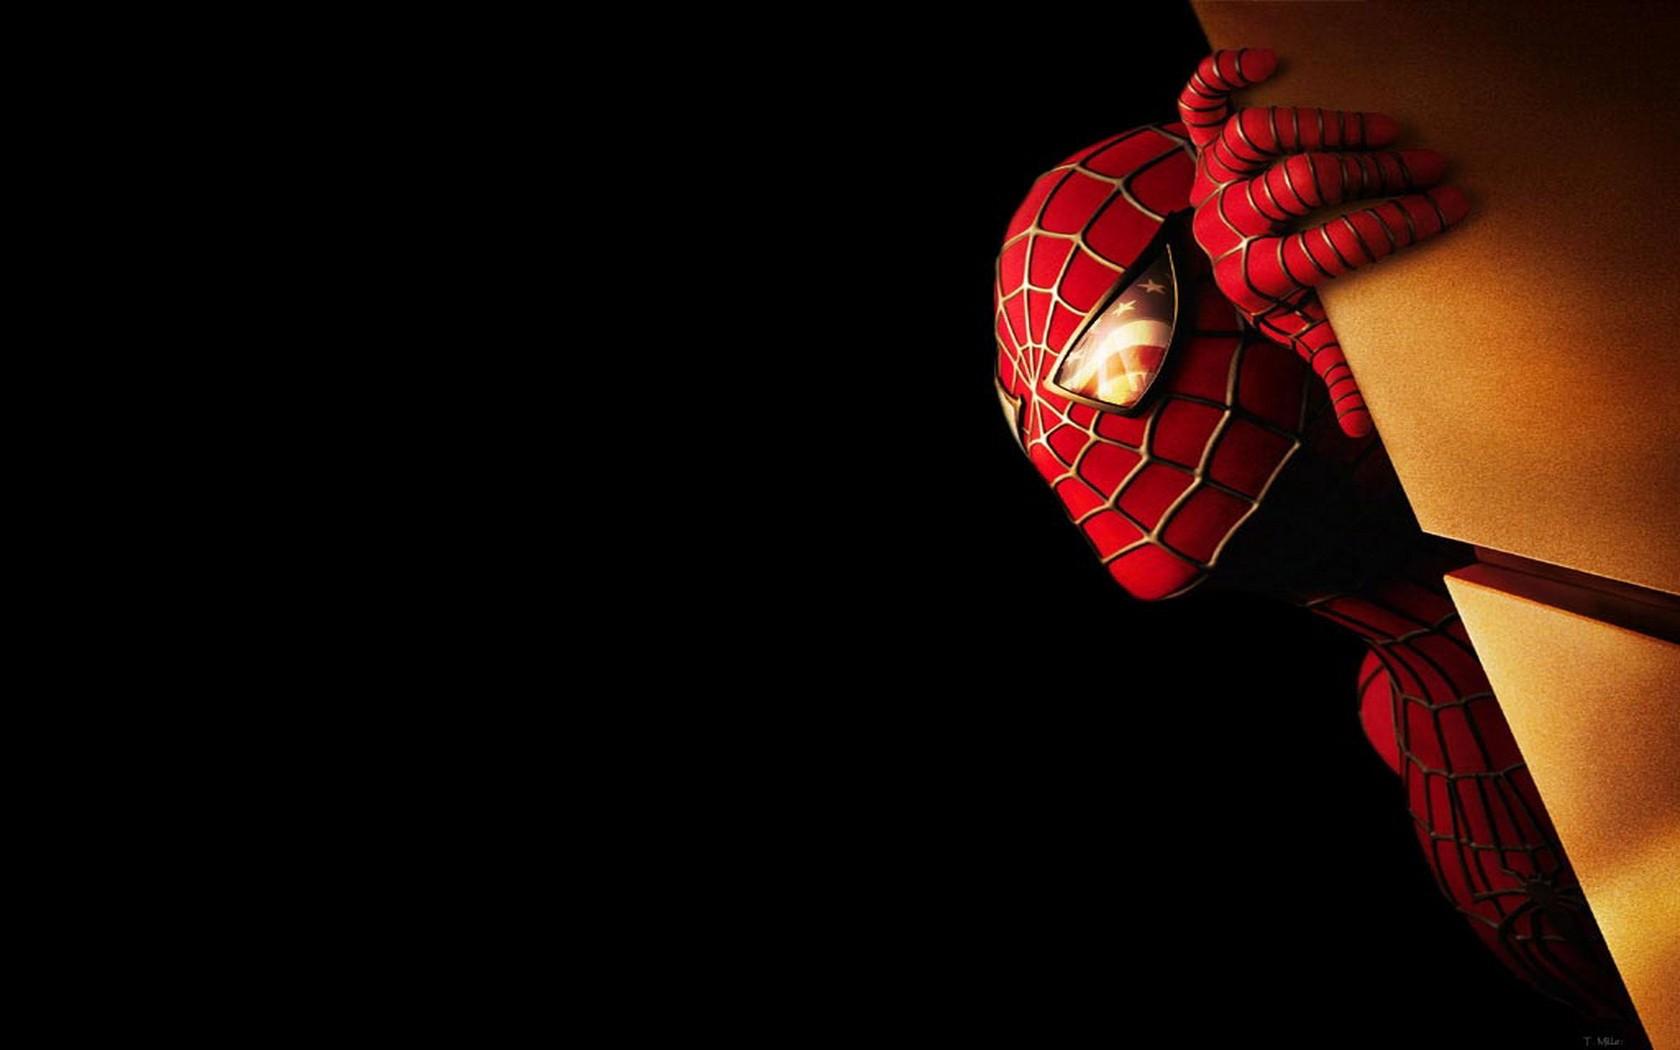 Spiderman 2013 - 1680x1050